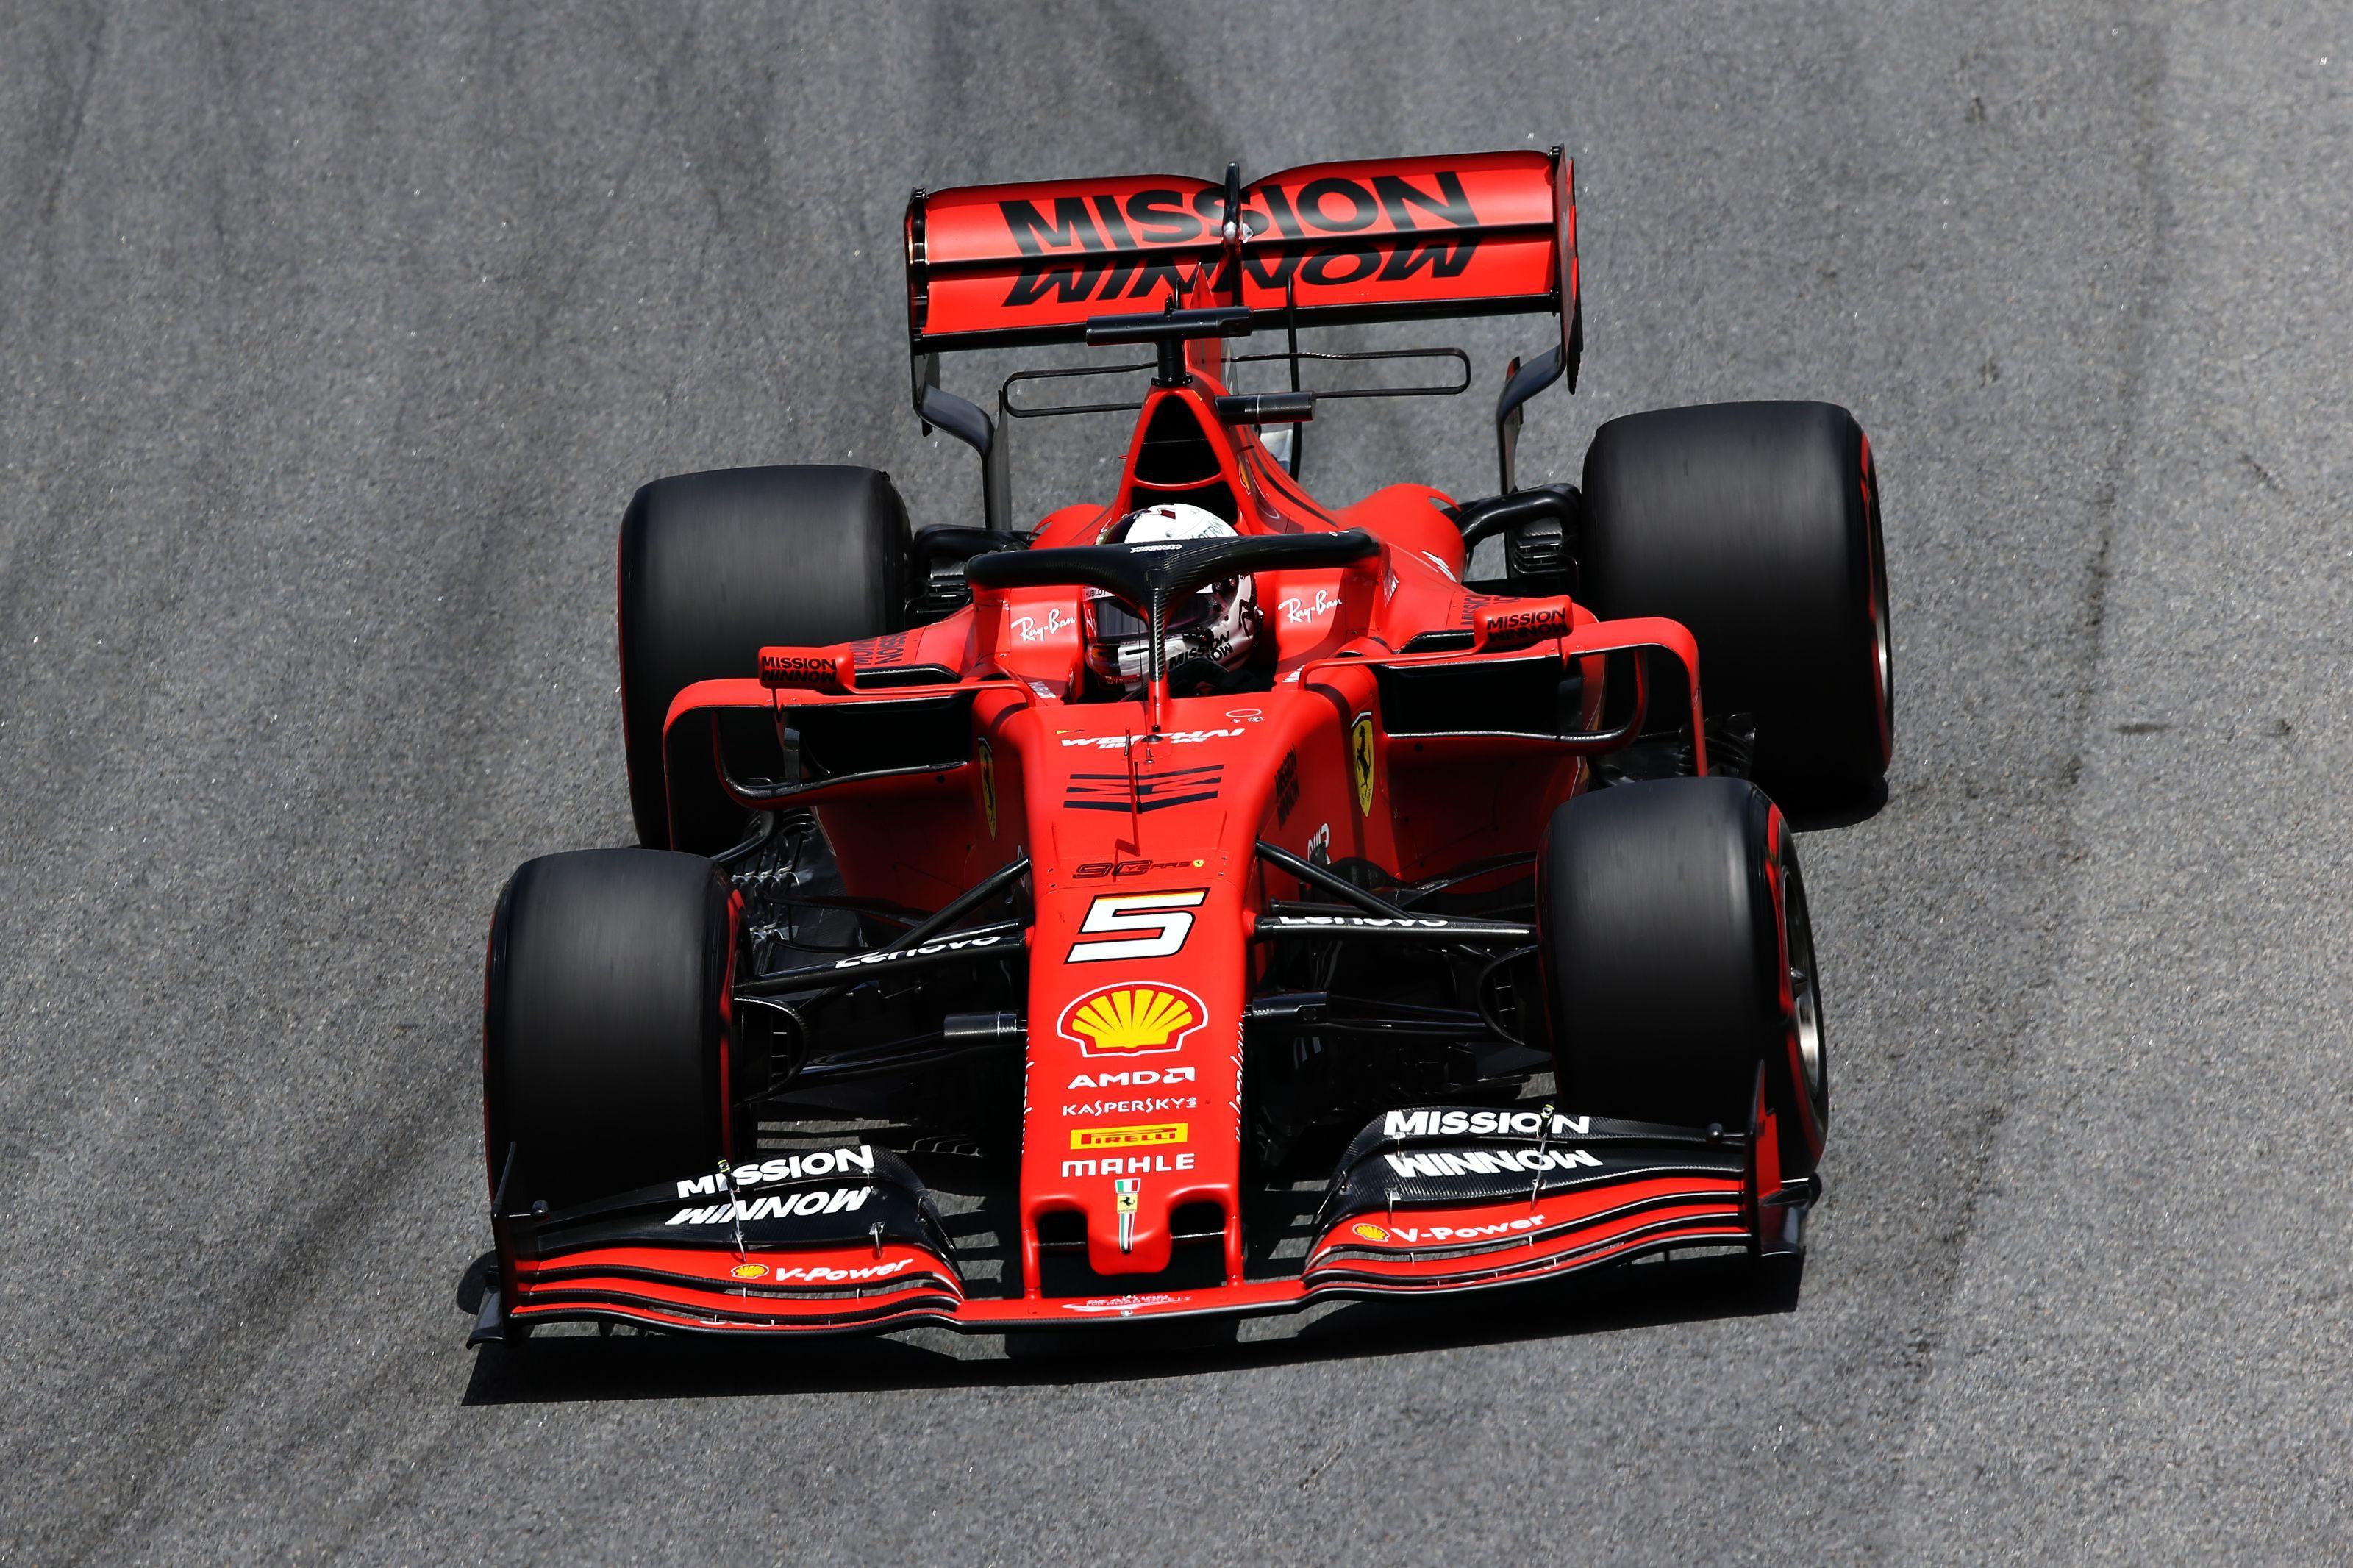 Rapid Reaction Our First Take Technical Analysis Of Ferrari S 2020 Sf1000 F1 Car Formula 1 In 2020 Ferrari Car New Engine